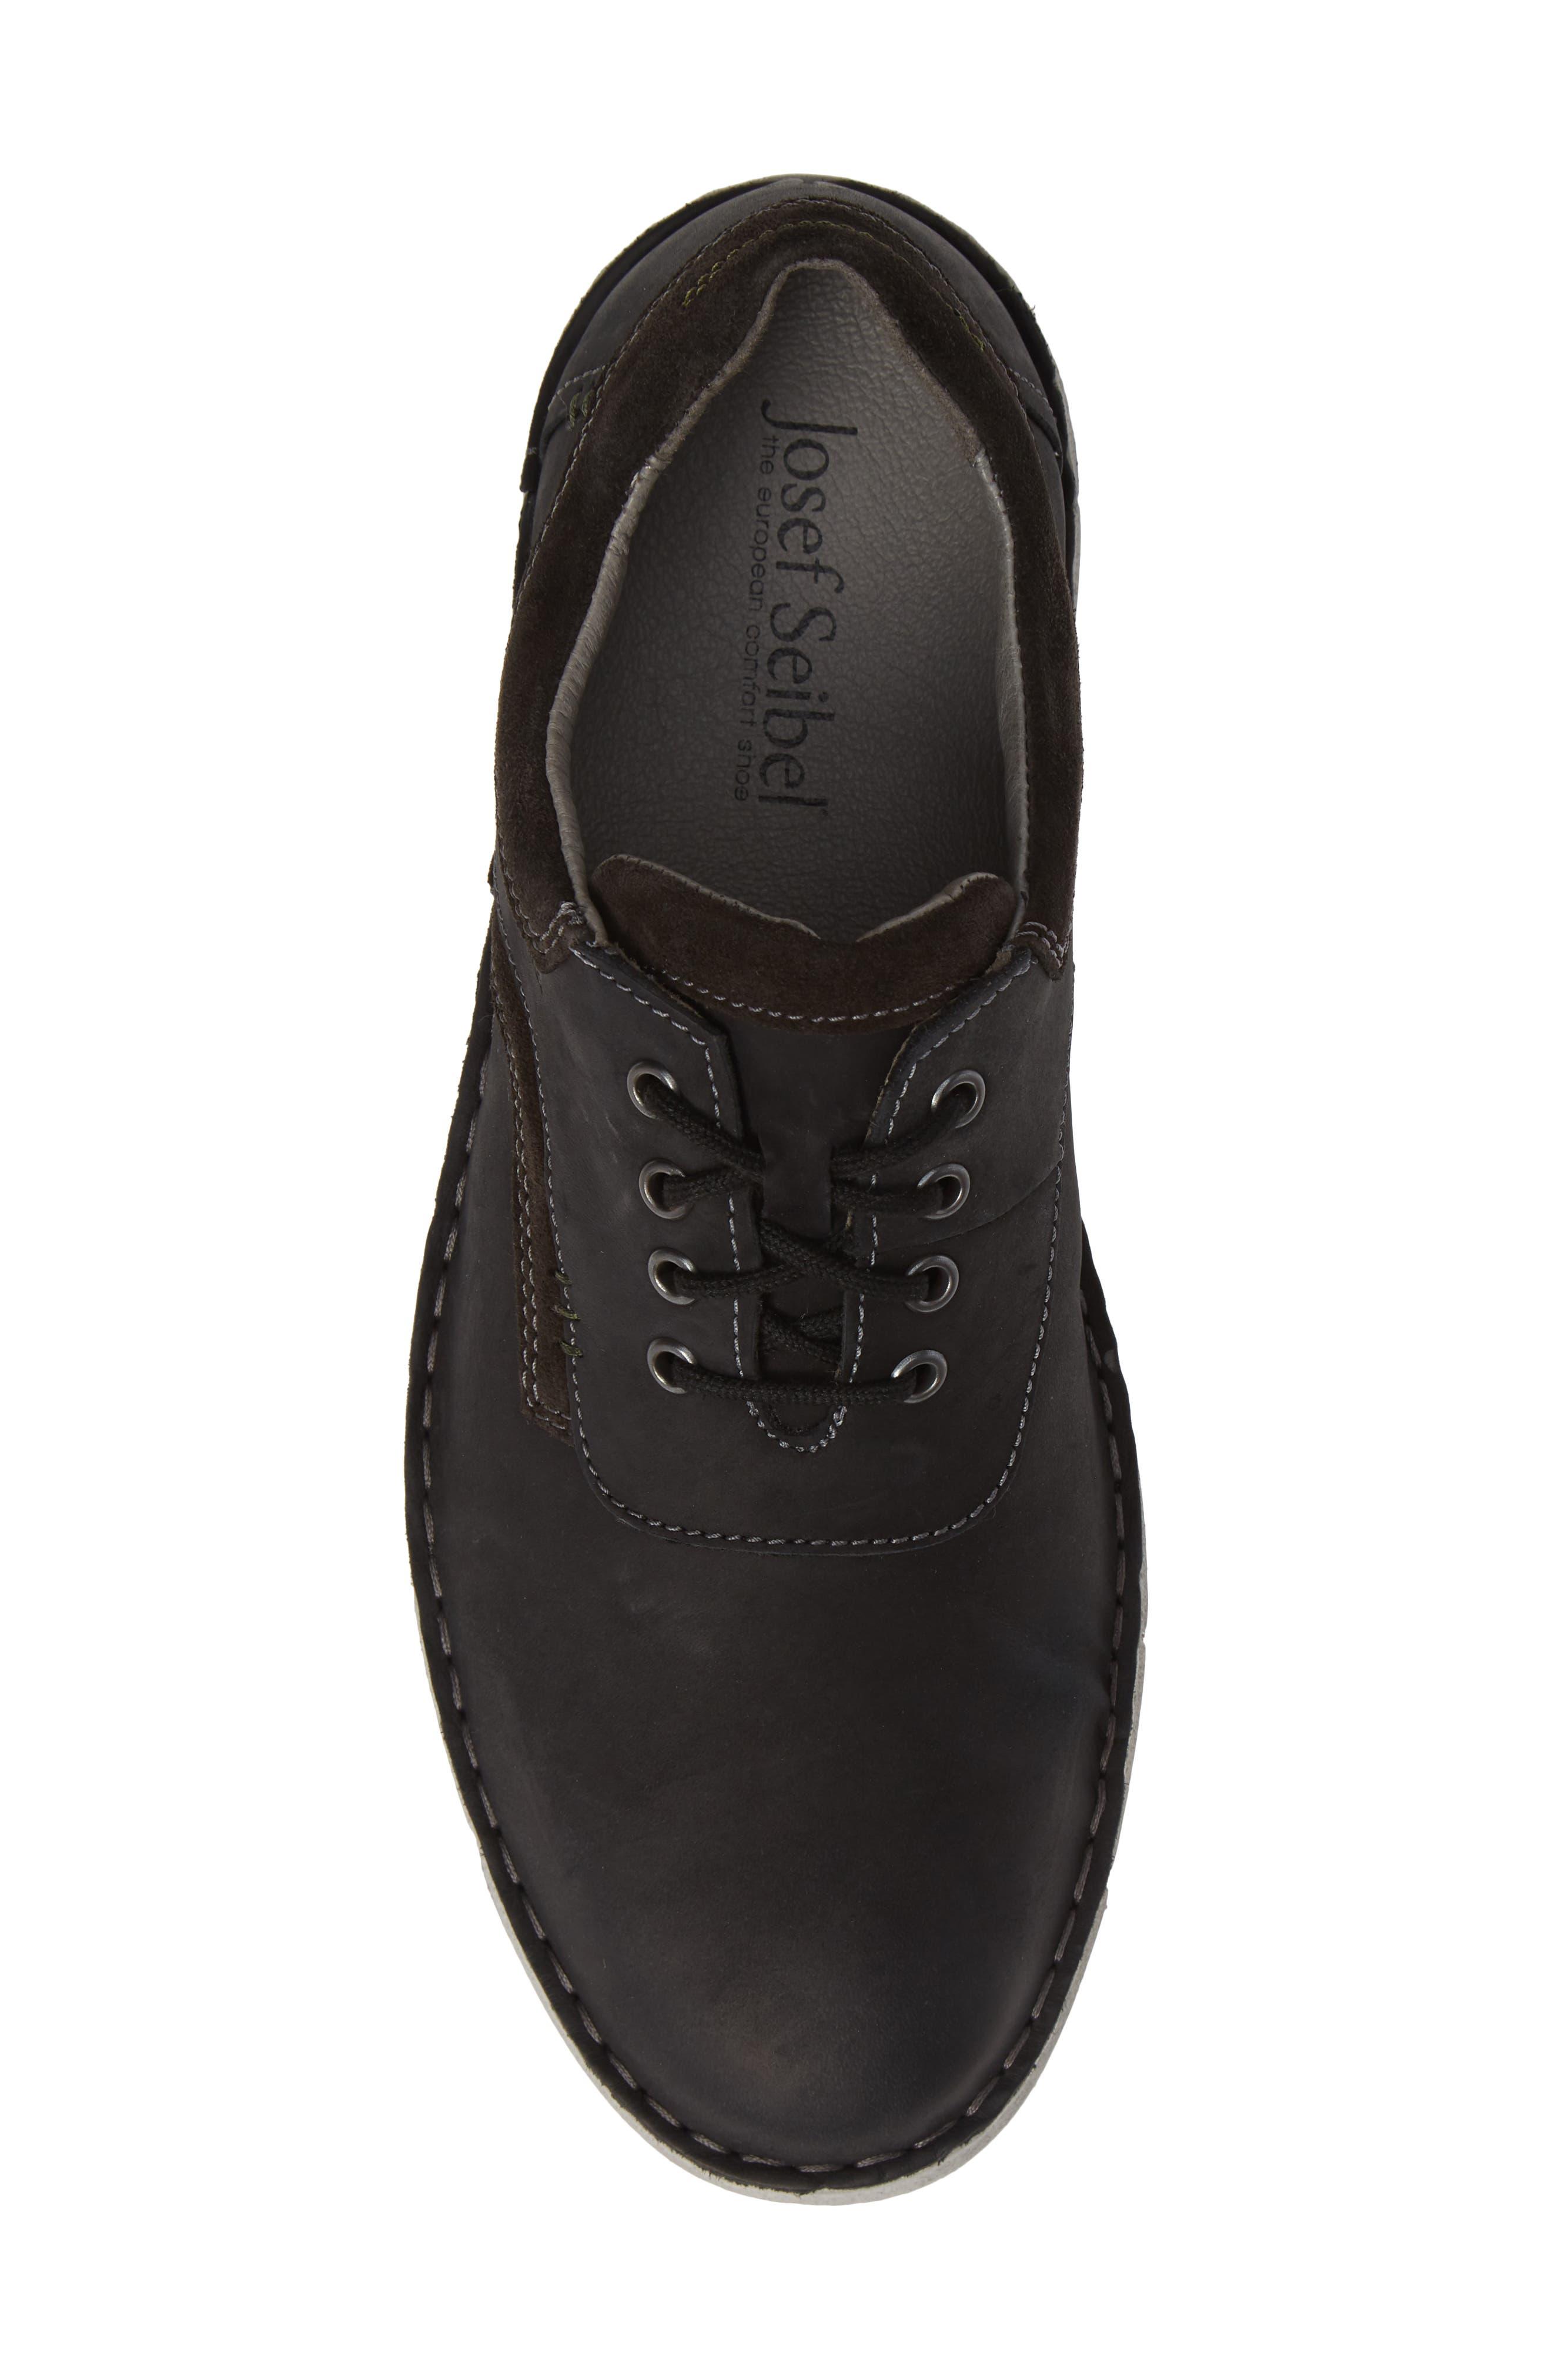 Ruben 13 Plain Toe Oxford,                             Alternate thumbnail 5, color,                             BLACK MARANELLO SUEDE